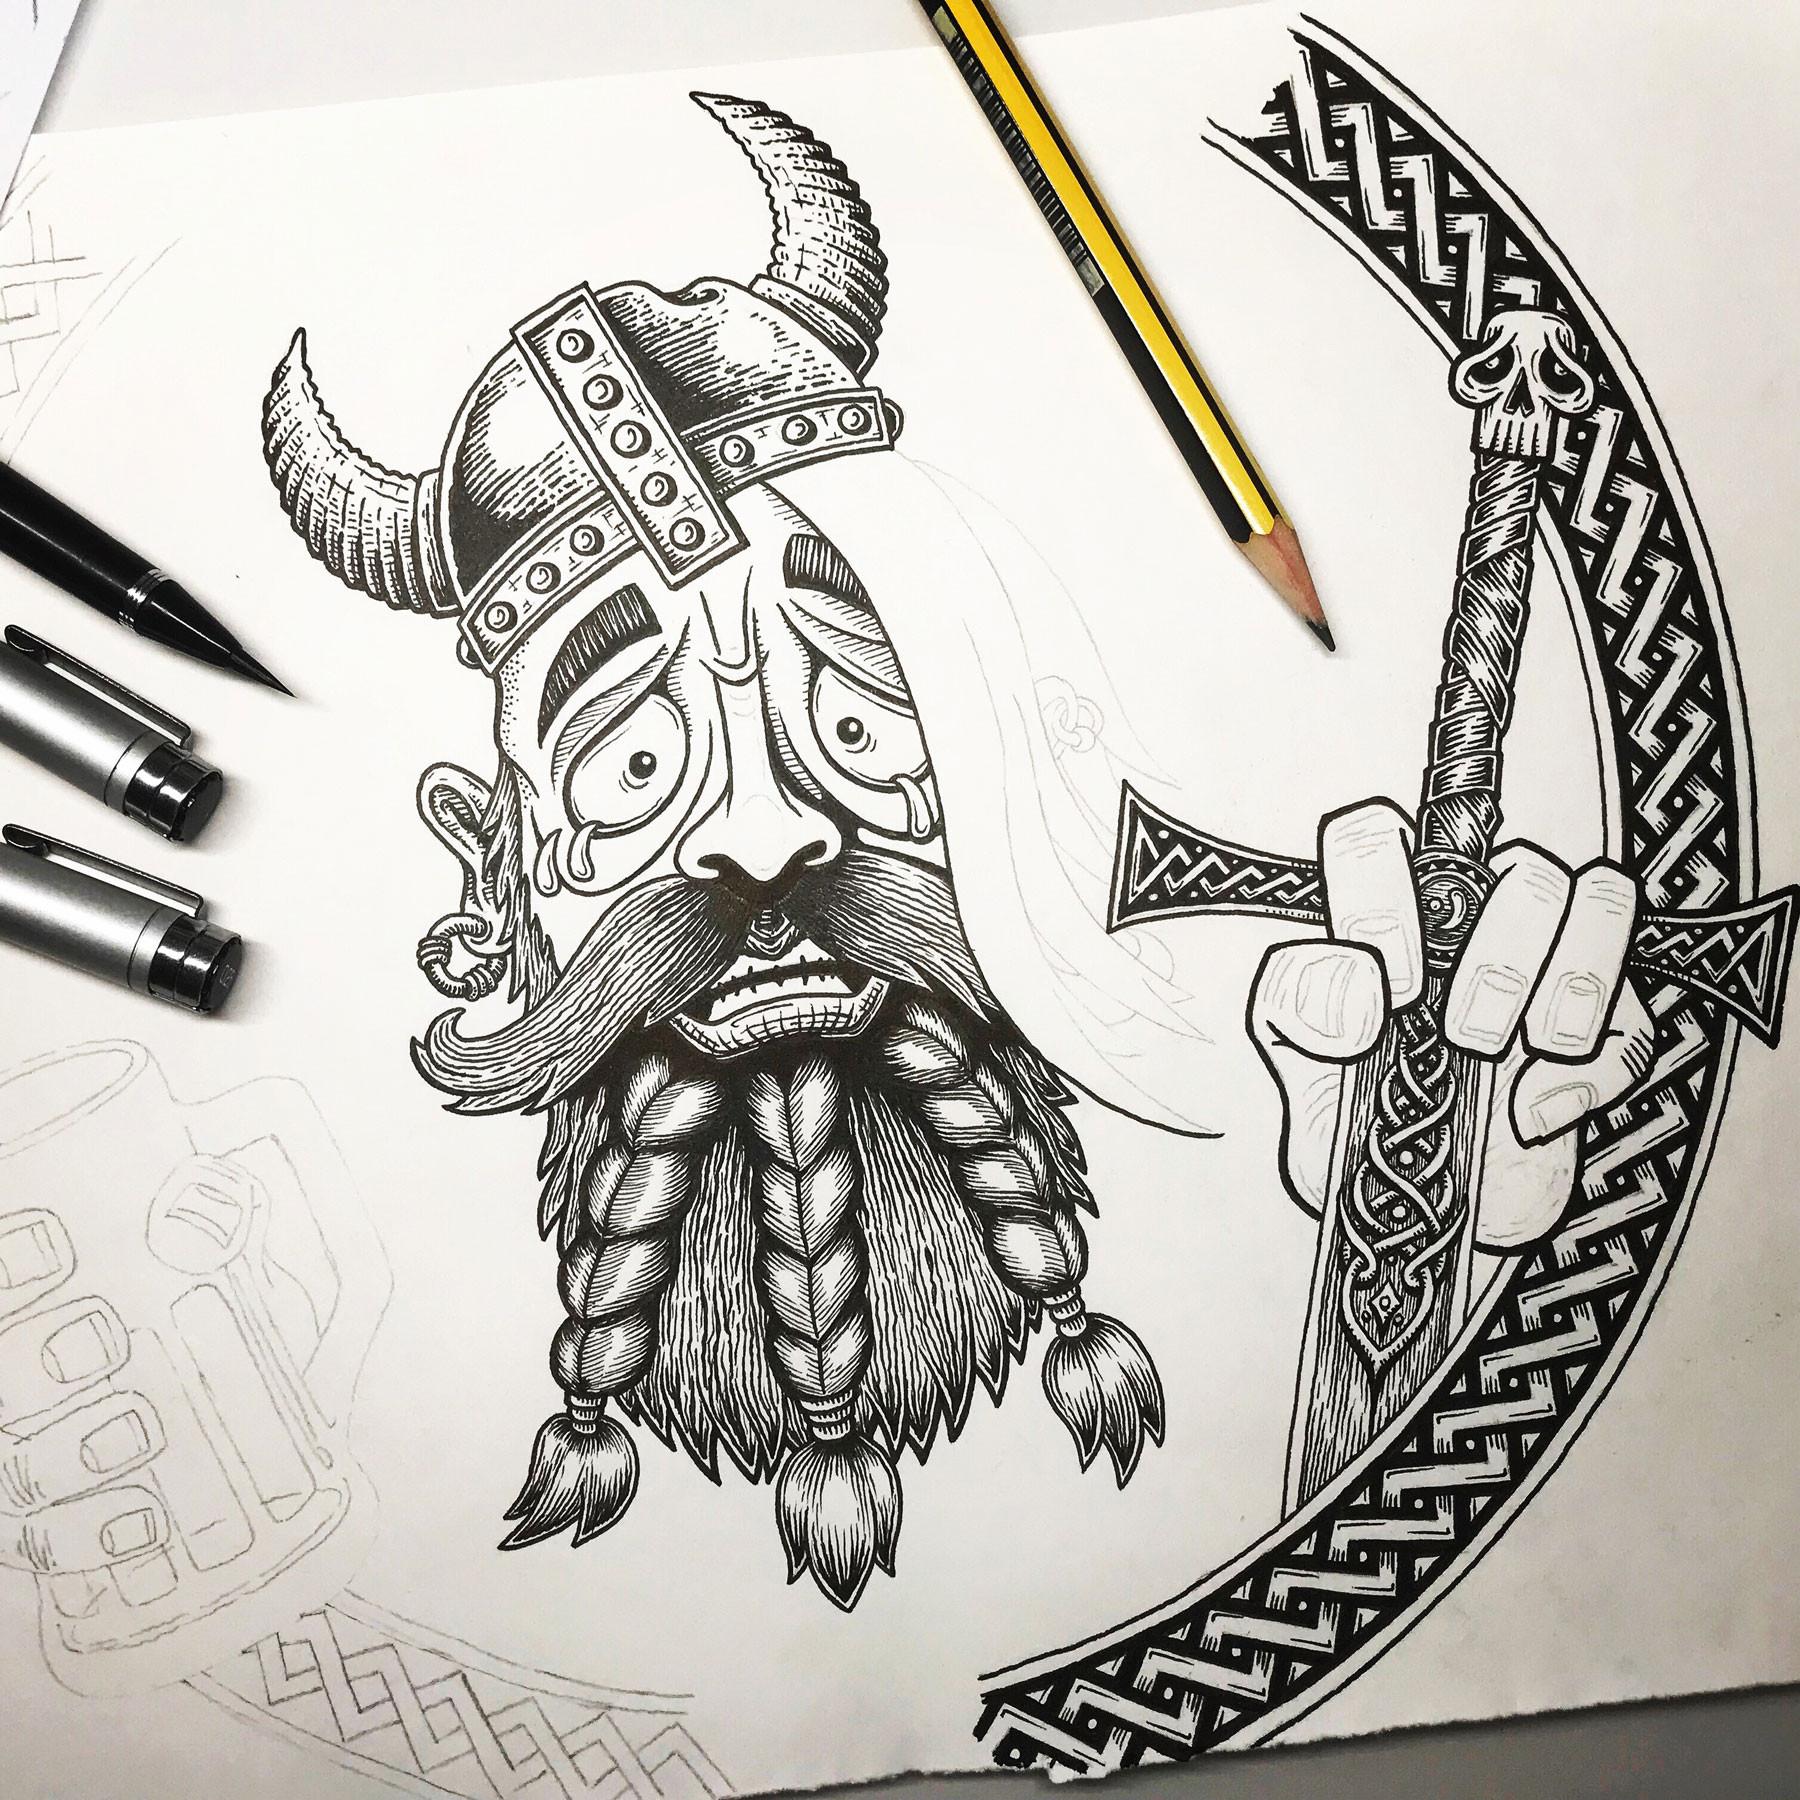 boot-beer-ivar-hand-drawn-tshirt-design-